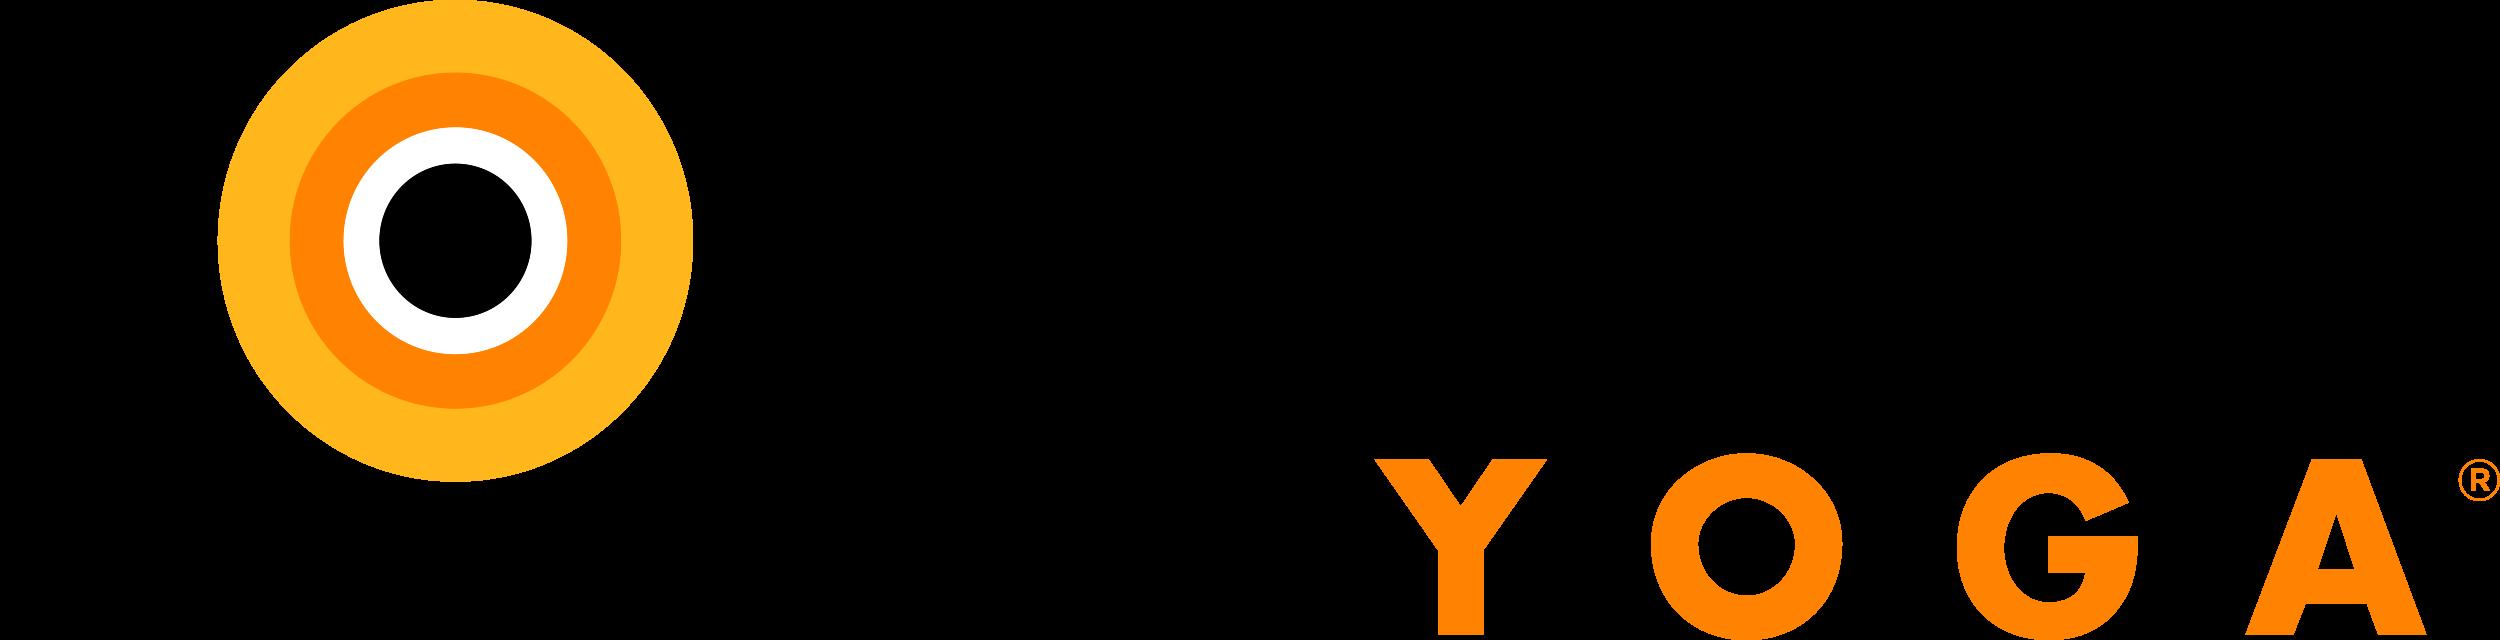 logo20171127-15258-1t78k26.png